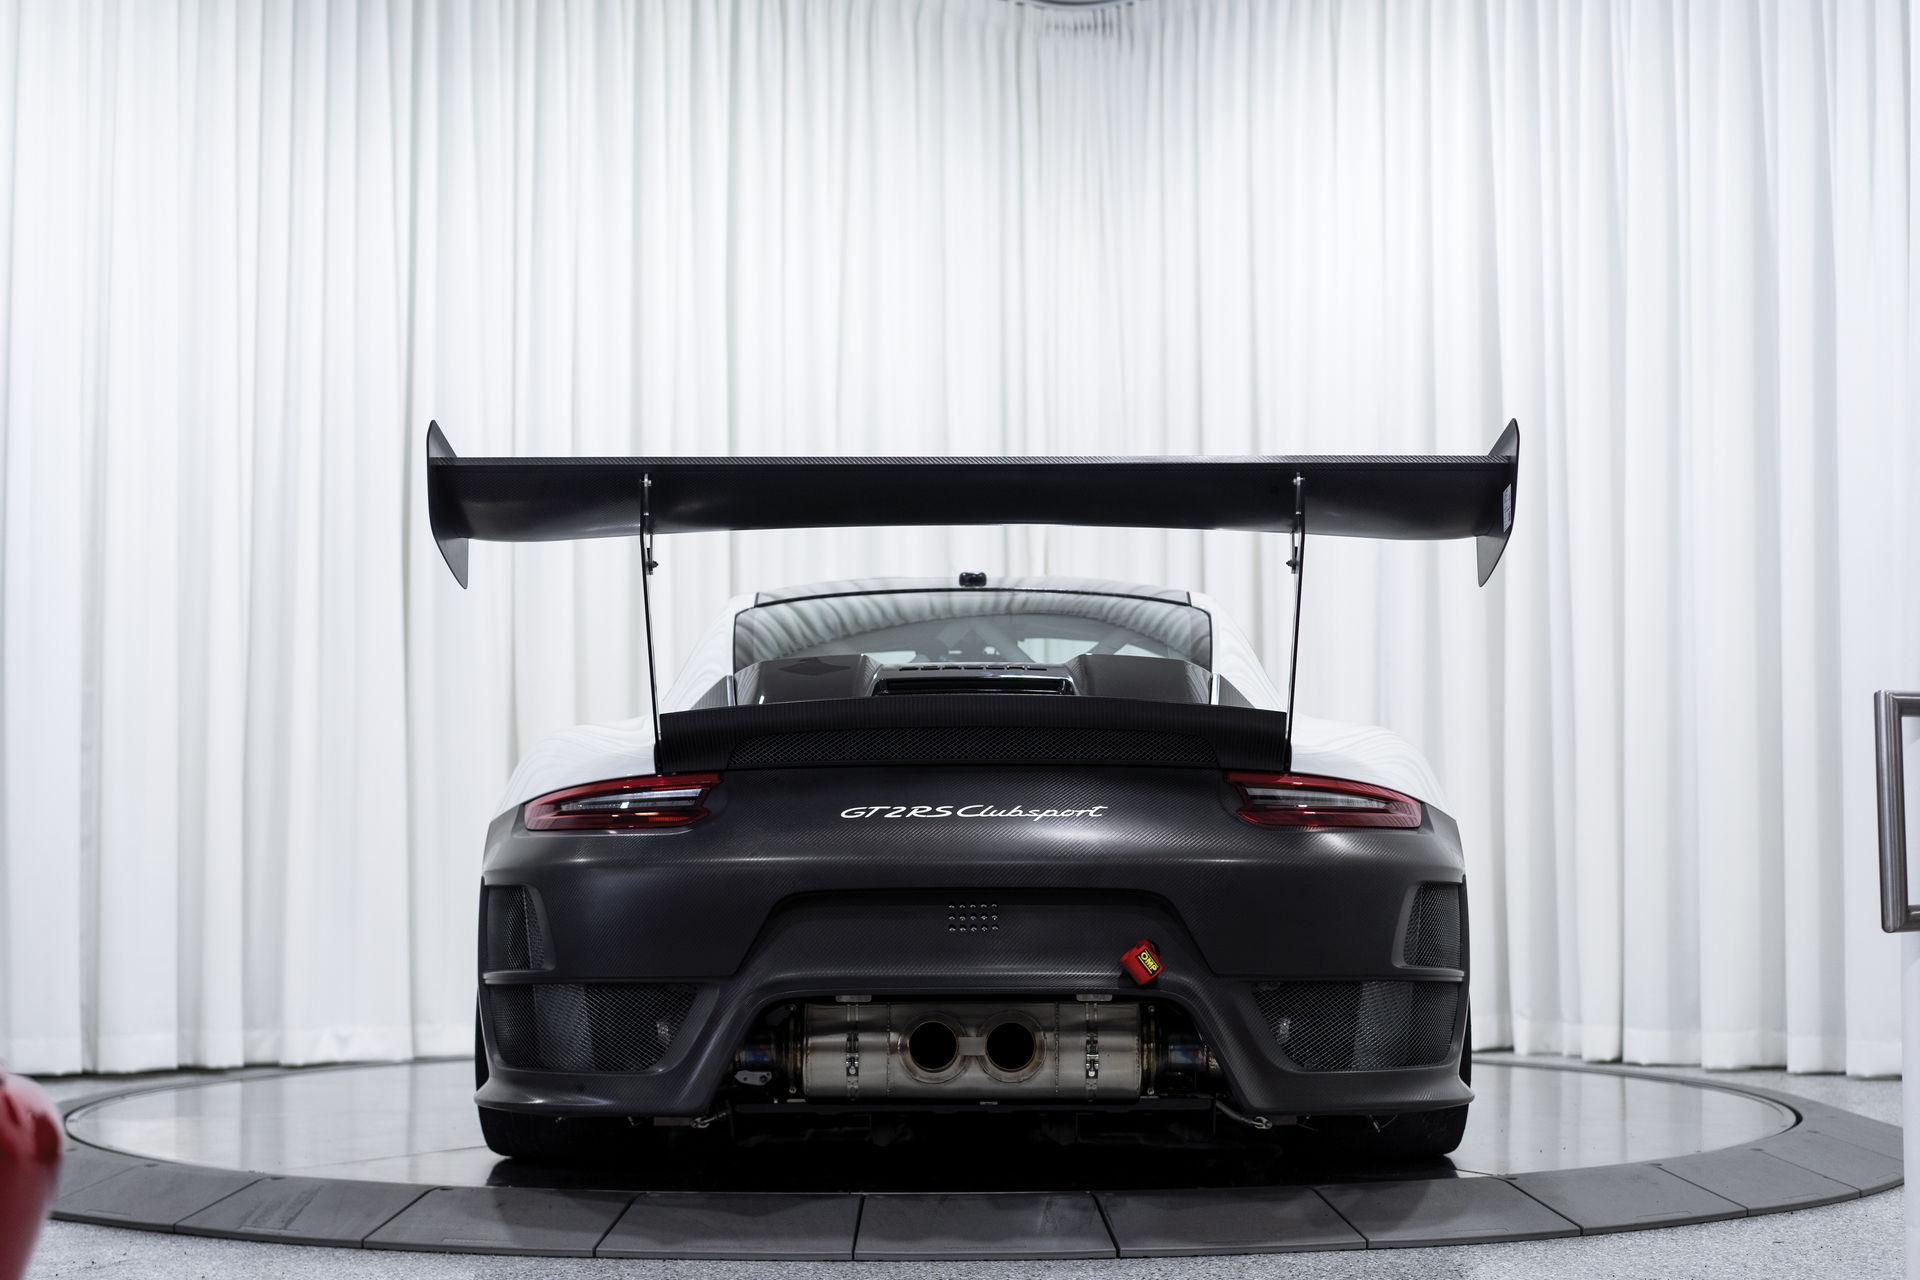 Porsche-911-GT2-RS-Clubsport-auction-3